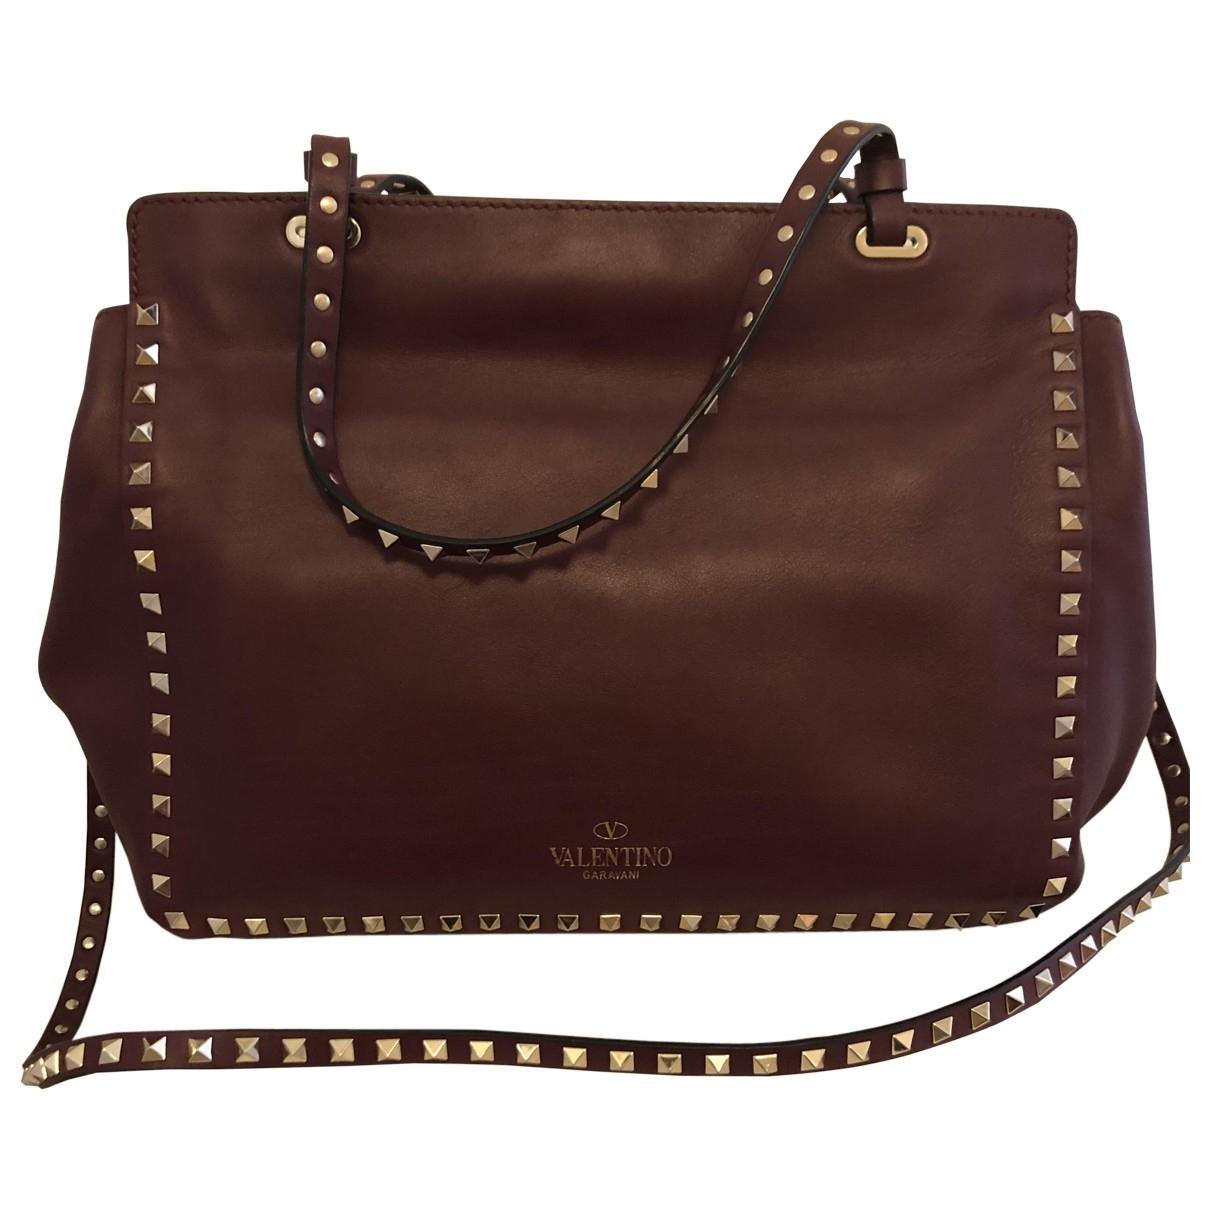 Valentino Garavani Rockstud Burgundy Leather handbag for Women \N